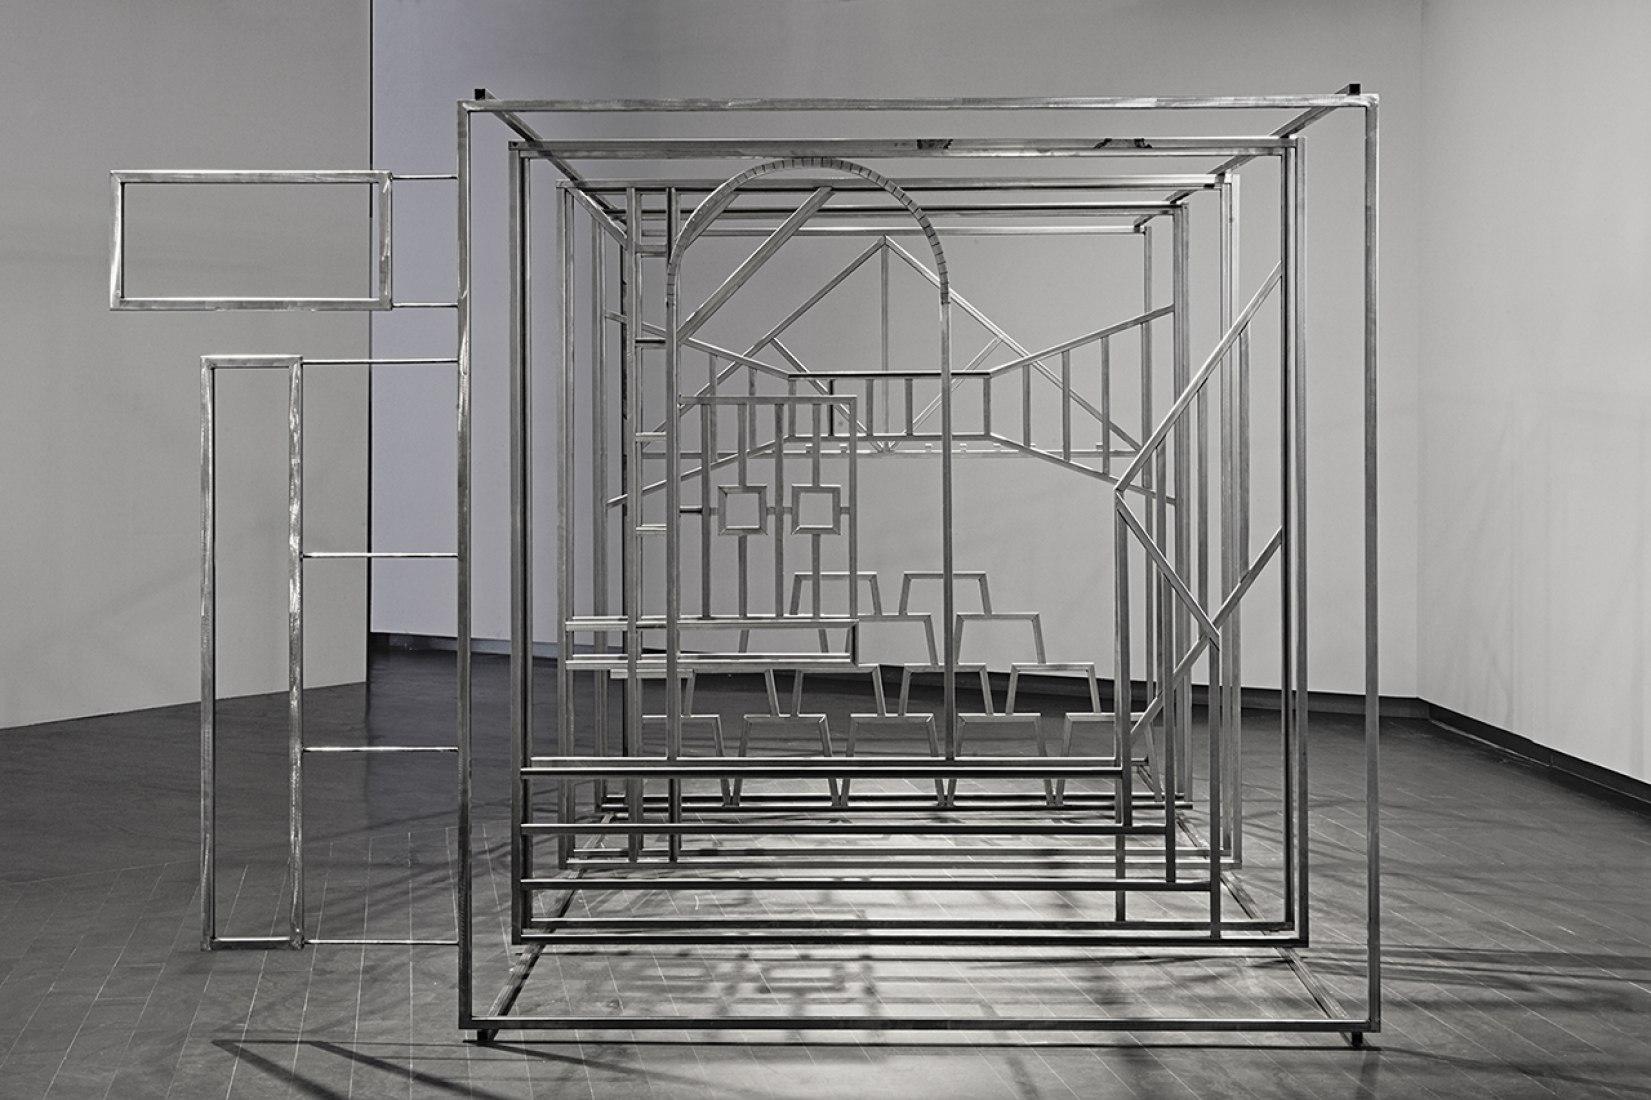 Javier Peña Inbáñez. Scene. Structure. Iron. Photography © Asier Rúa.